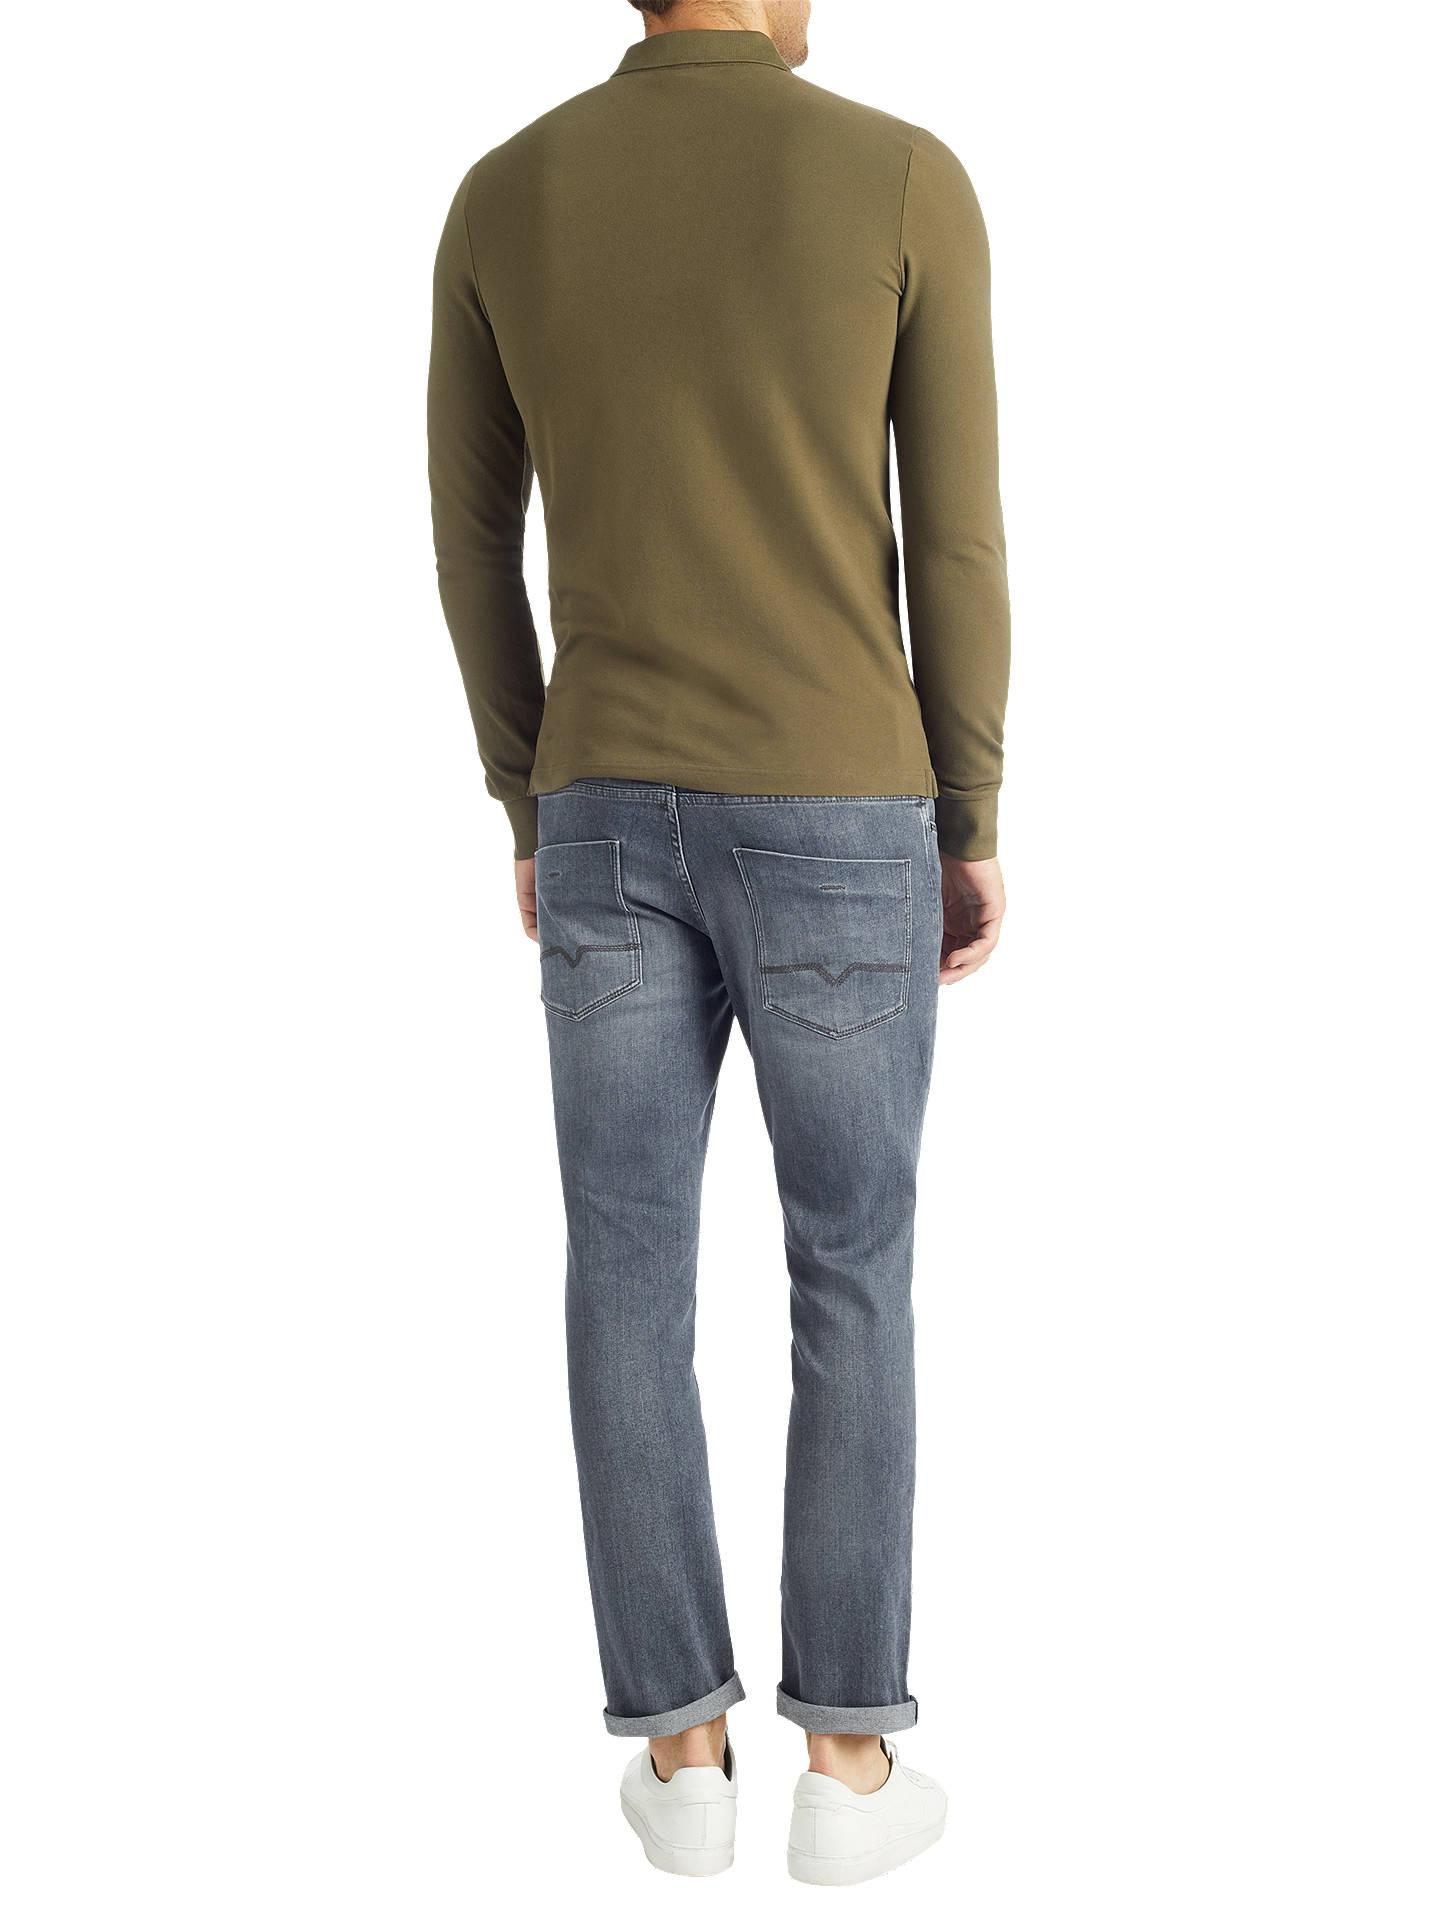 dbcba28ce ... Buy BOSS Orange Paulyn Long Sleeve Polo Top, Dark Green, S Online at  johnlewis ...